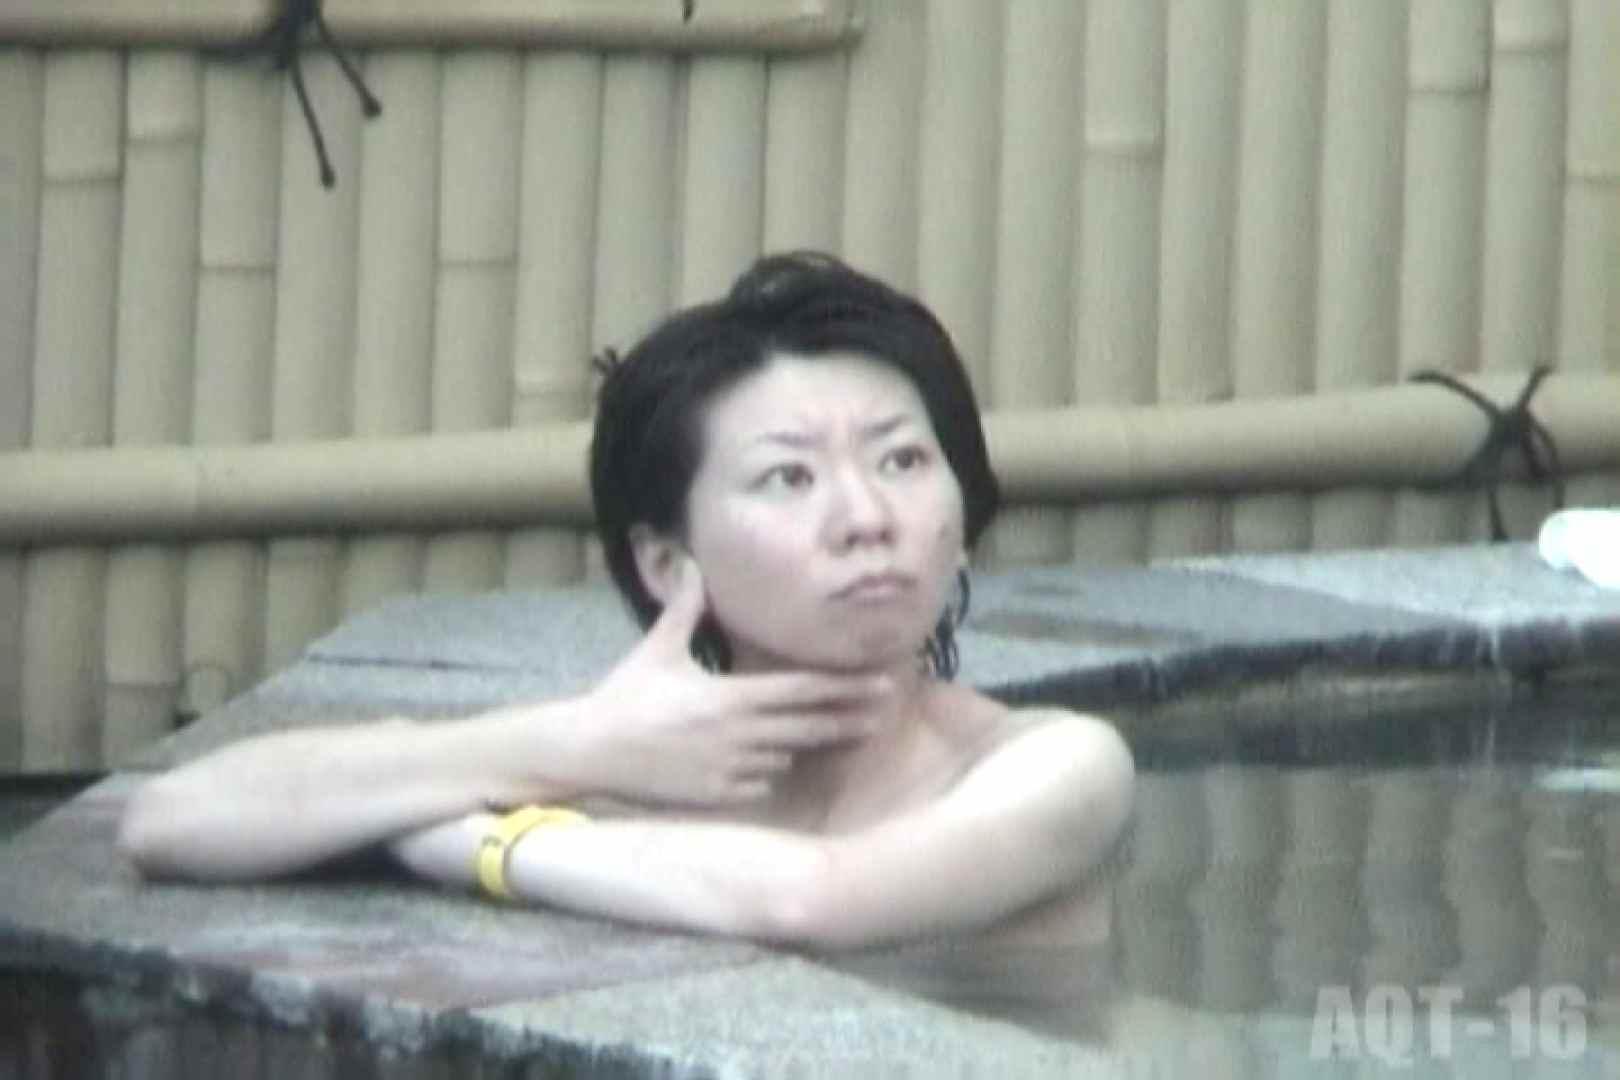 Aquaな露天風呂Vol.842 露天風呂編  82PIX 82